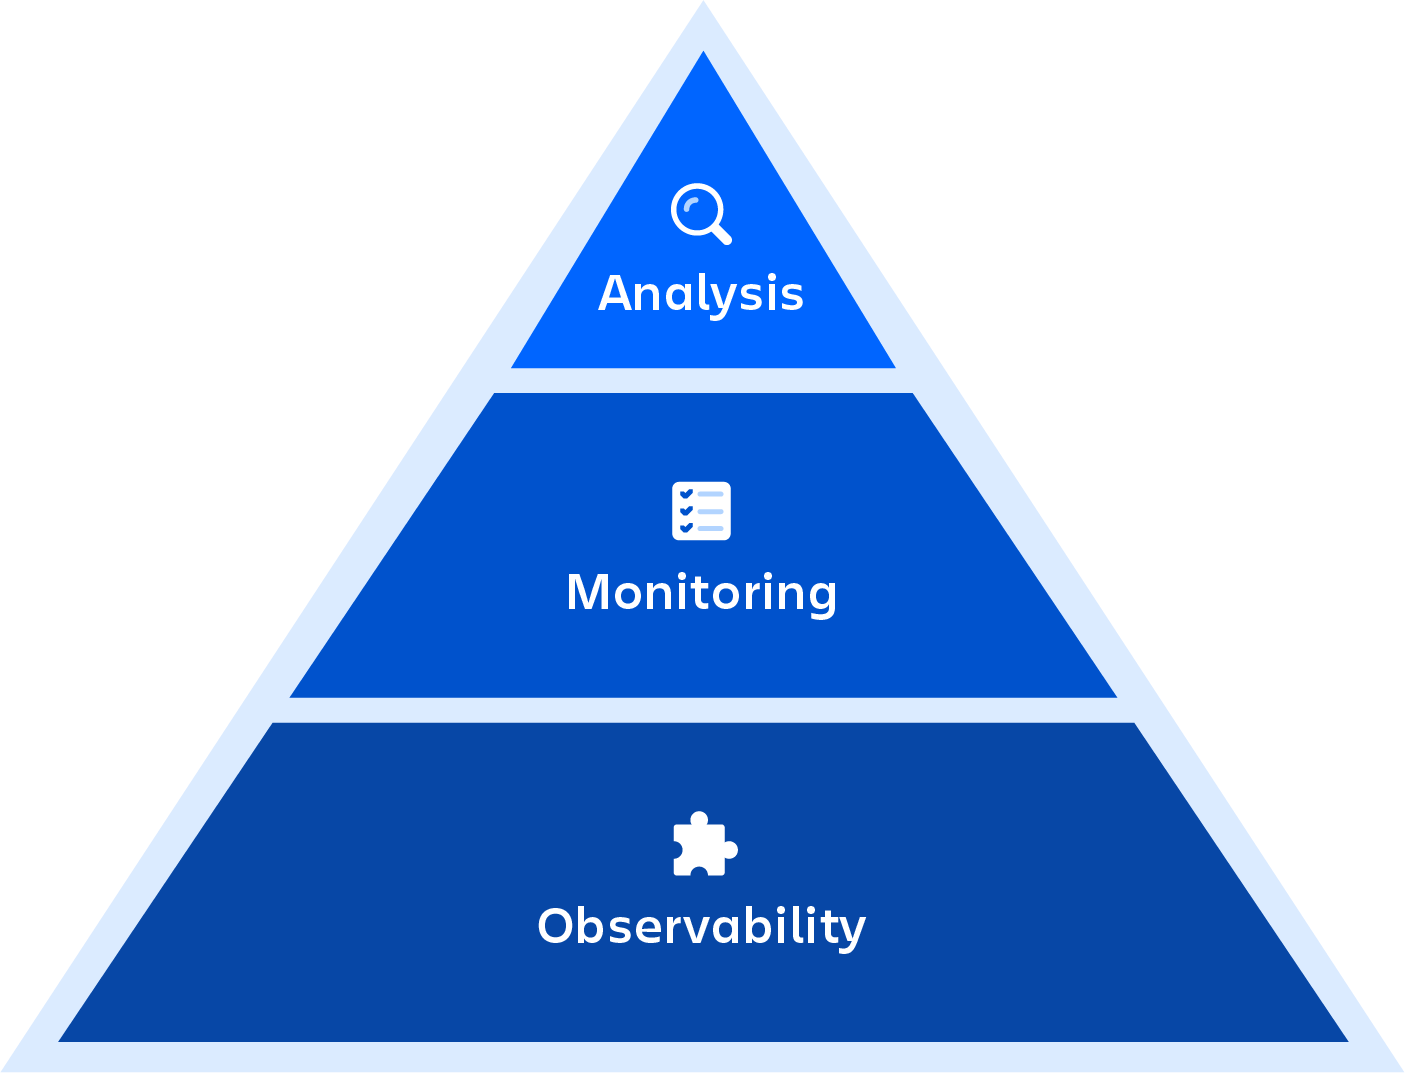 Monitoring versus observability diagram